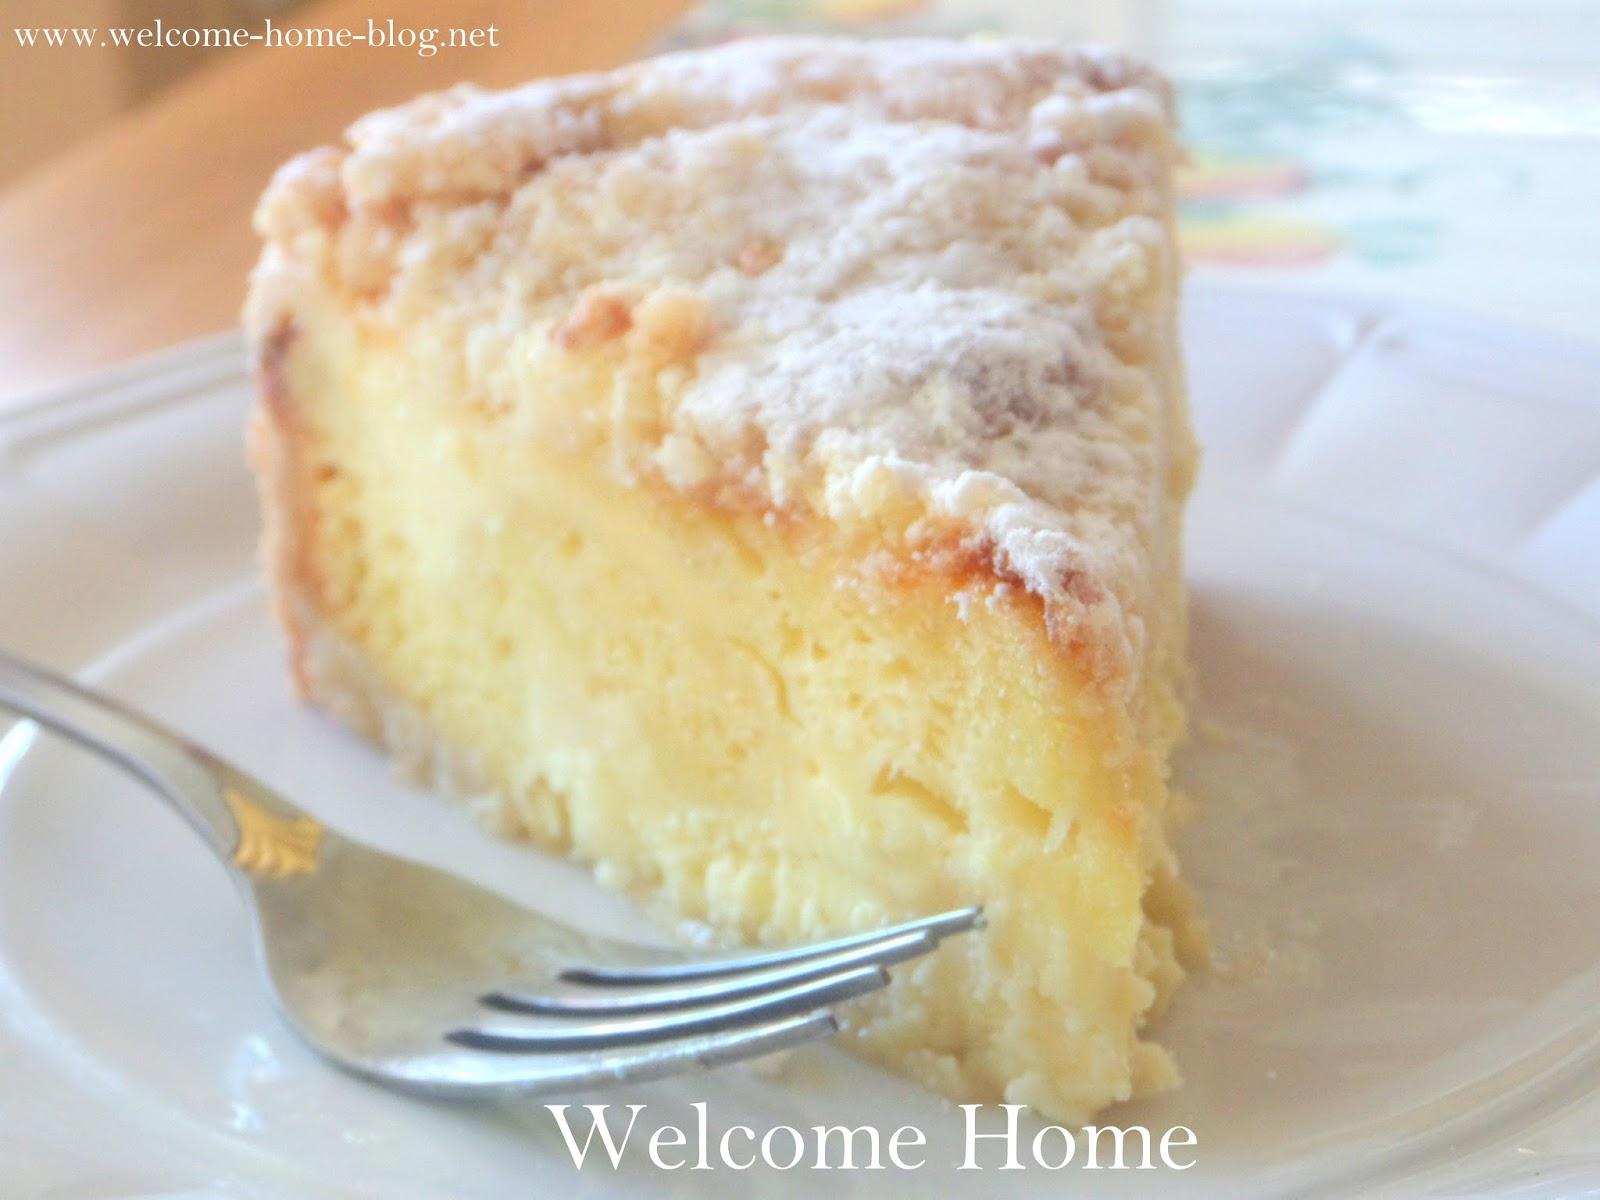 How To Make Yellow Cake Mix Into Lemon Cake